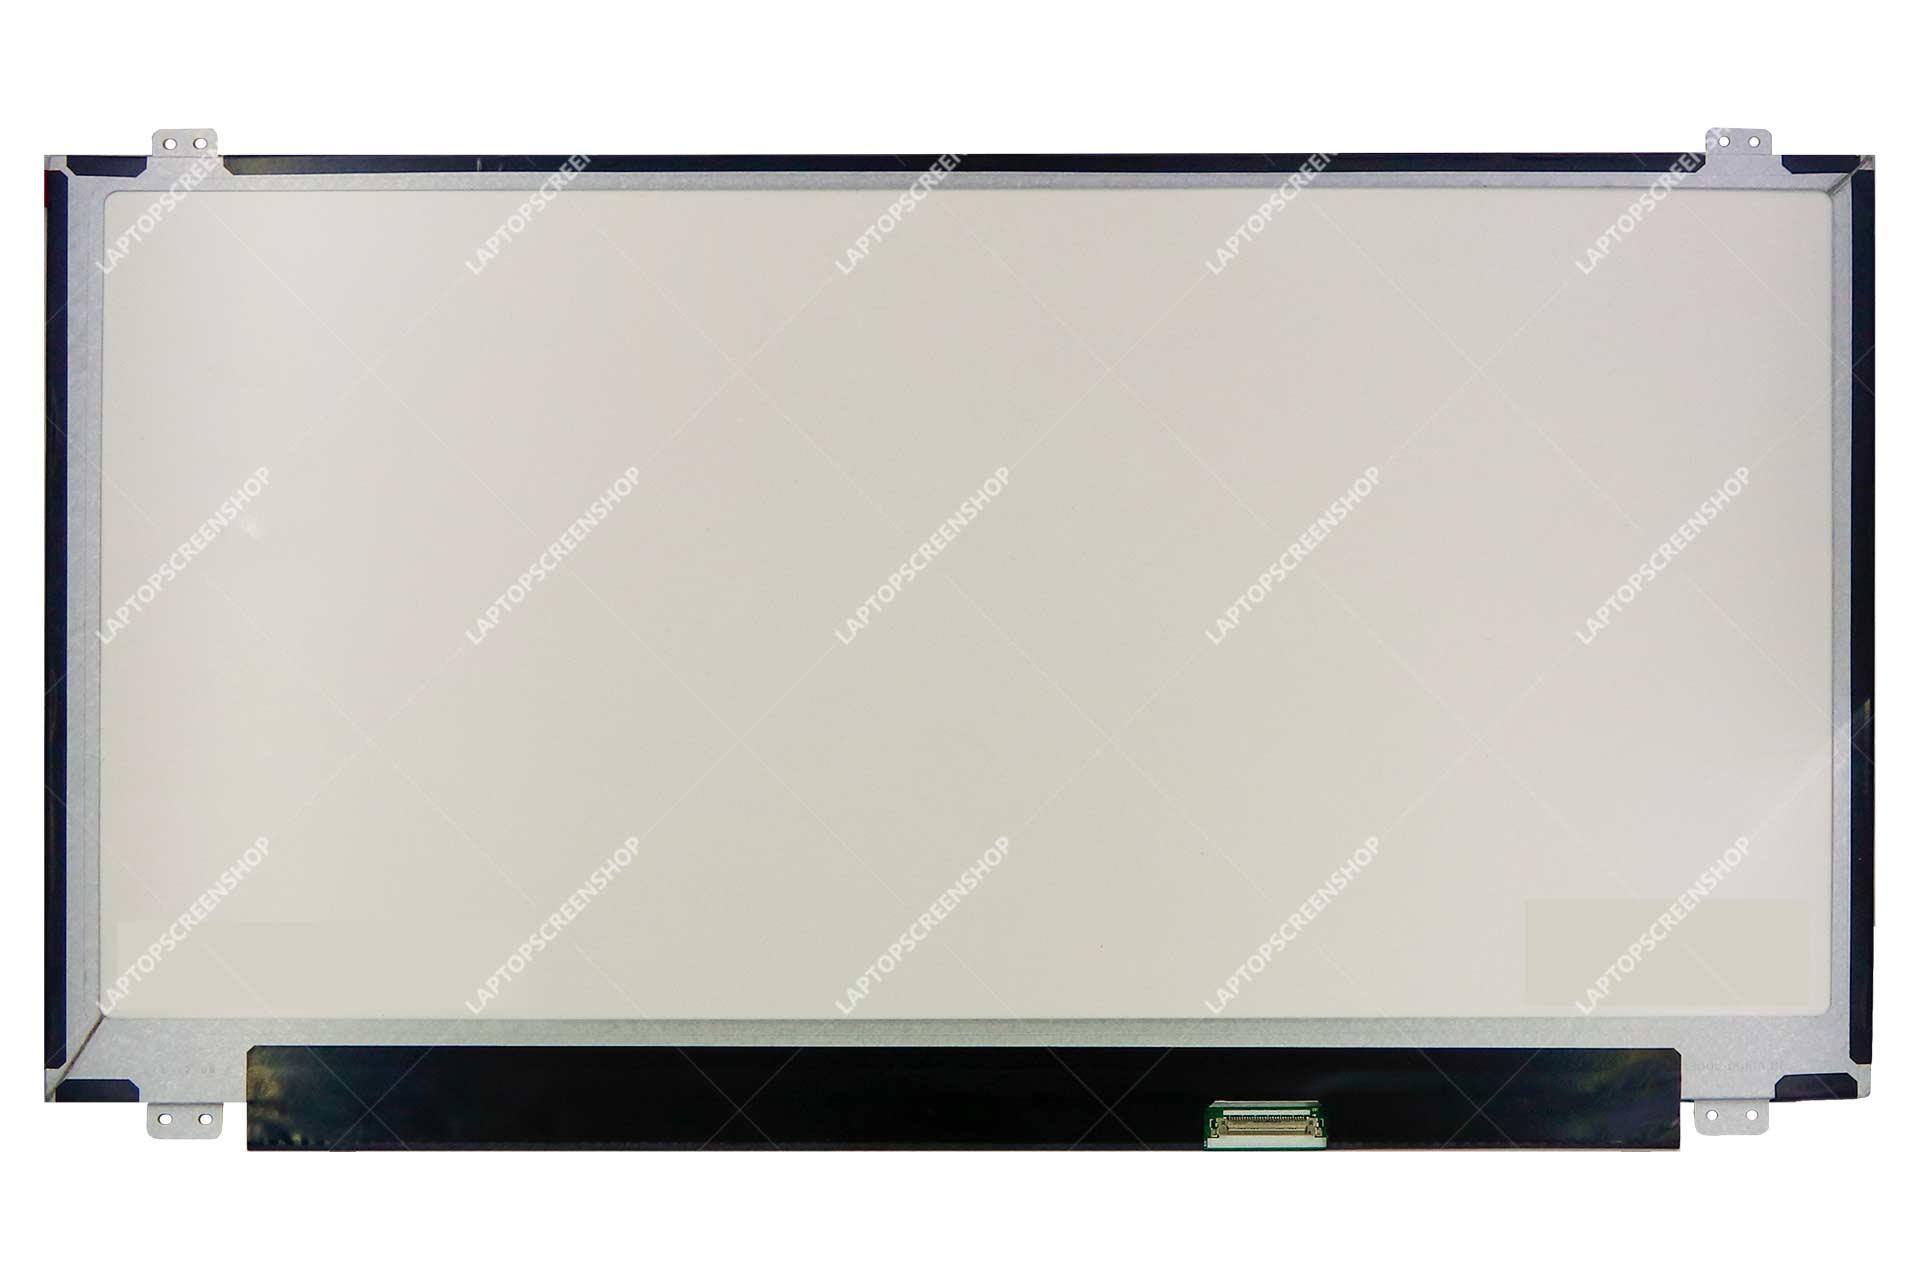 ACER-ASPIRE-E1-522-3442-LCD |HD|فروشگاه لپ تاپ اسکرين | تعمير لپ تاپ